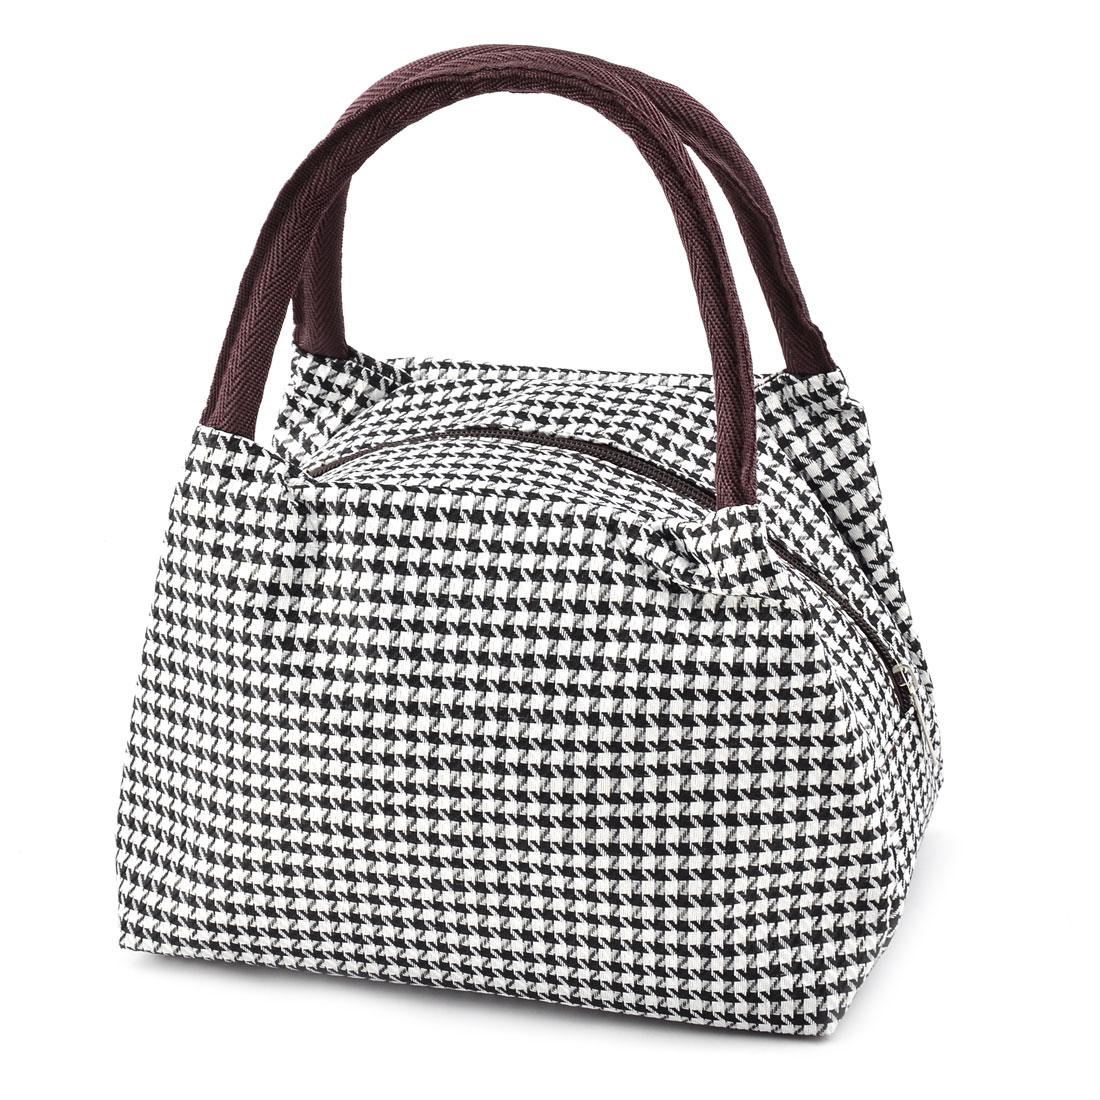 Outdoor Linen Cotton Stripe Pattern Lunch Holder Cooler Pouch Bag Black White